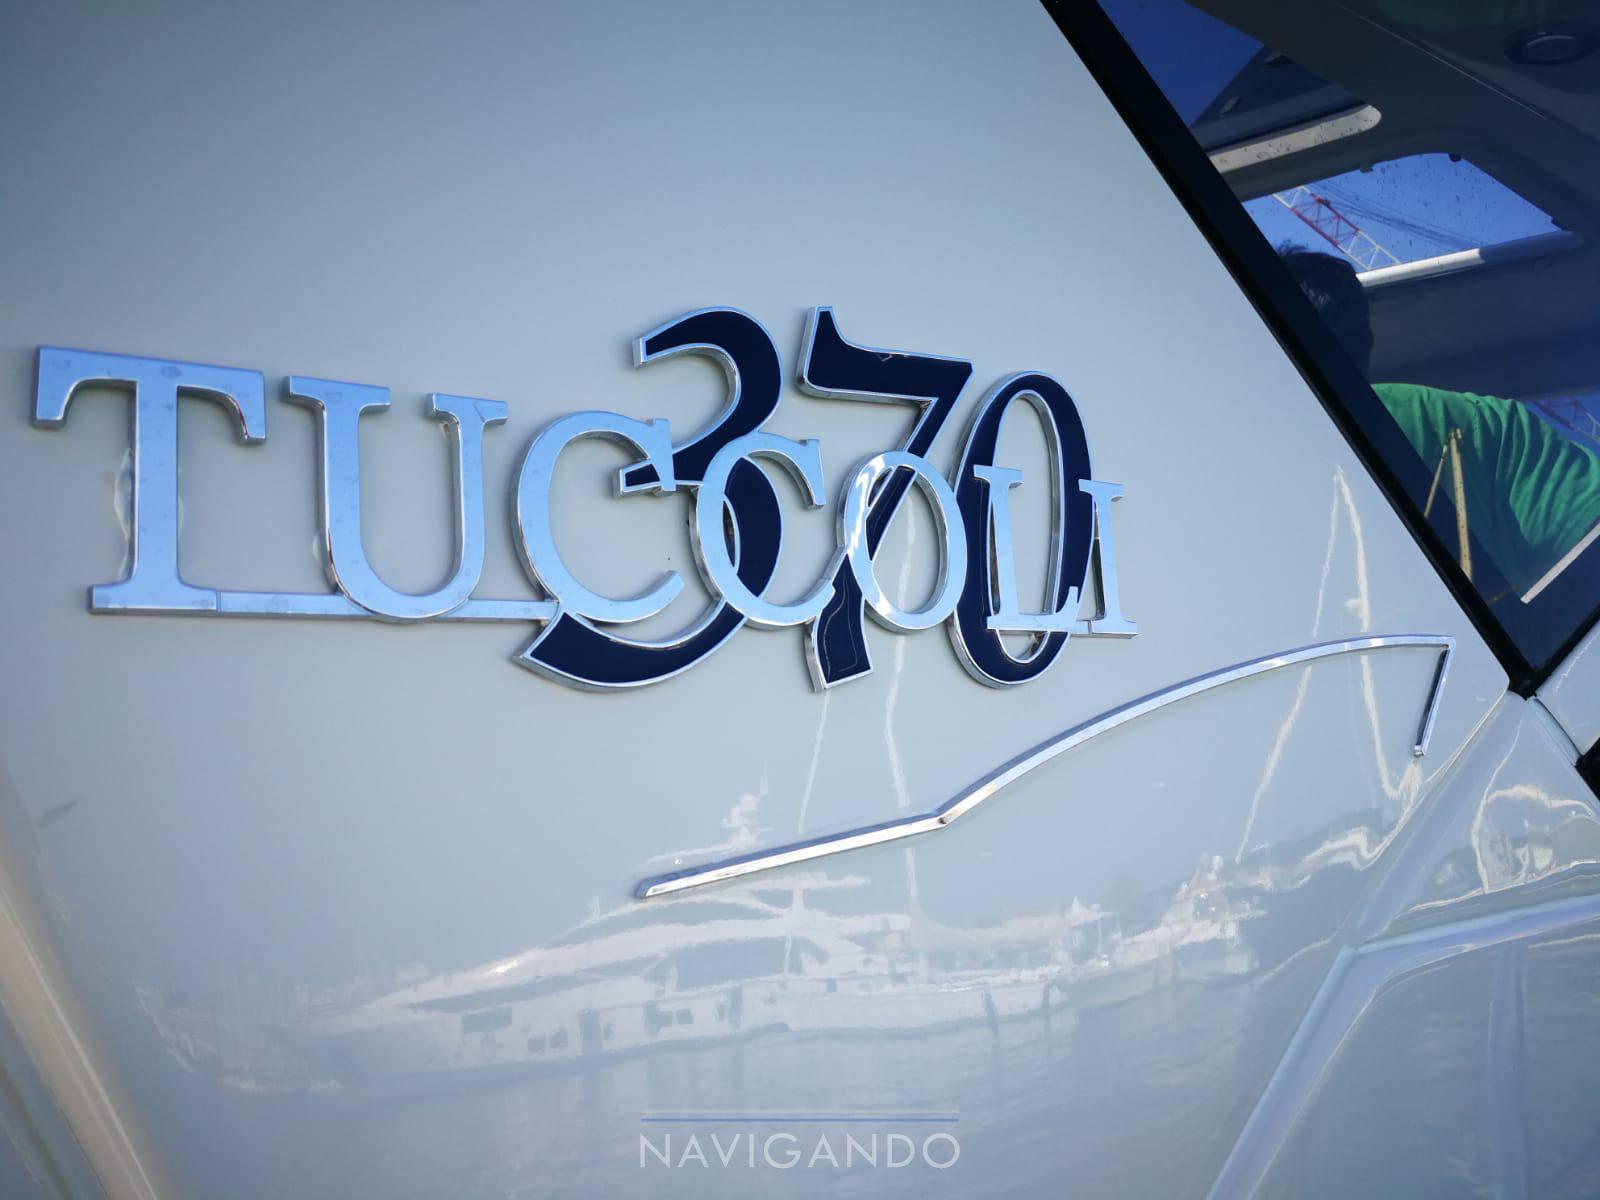 Tuccoli T 370 coupè Barca a motore usata in vendita